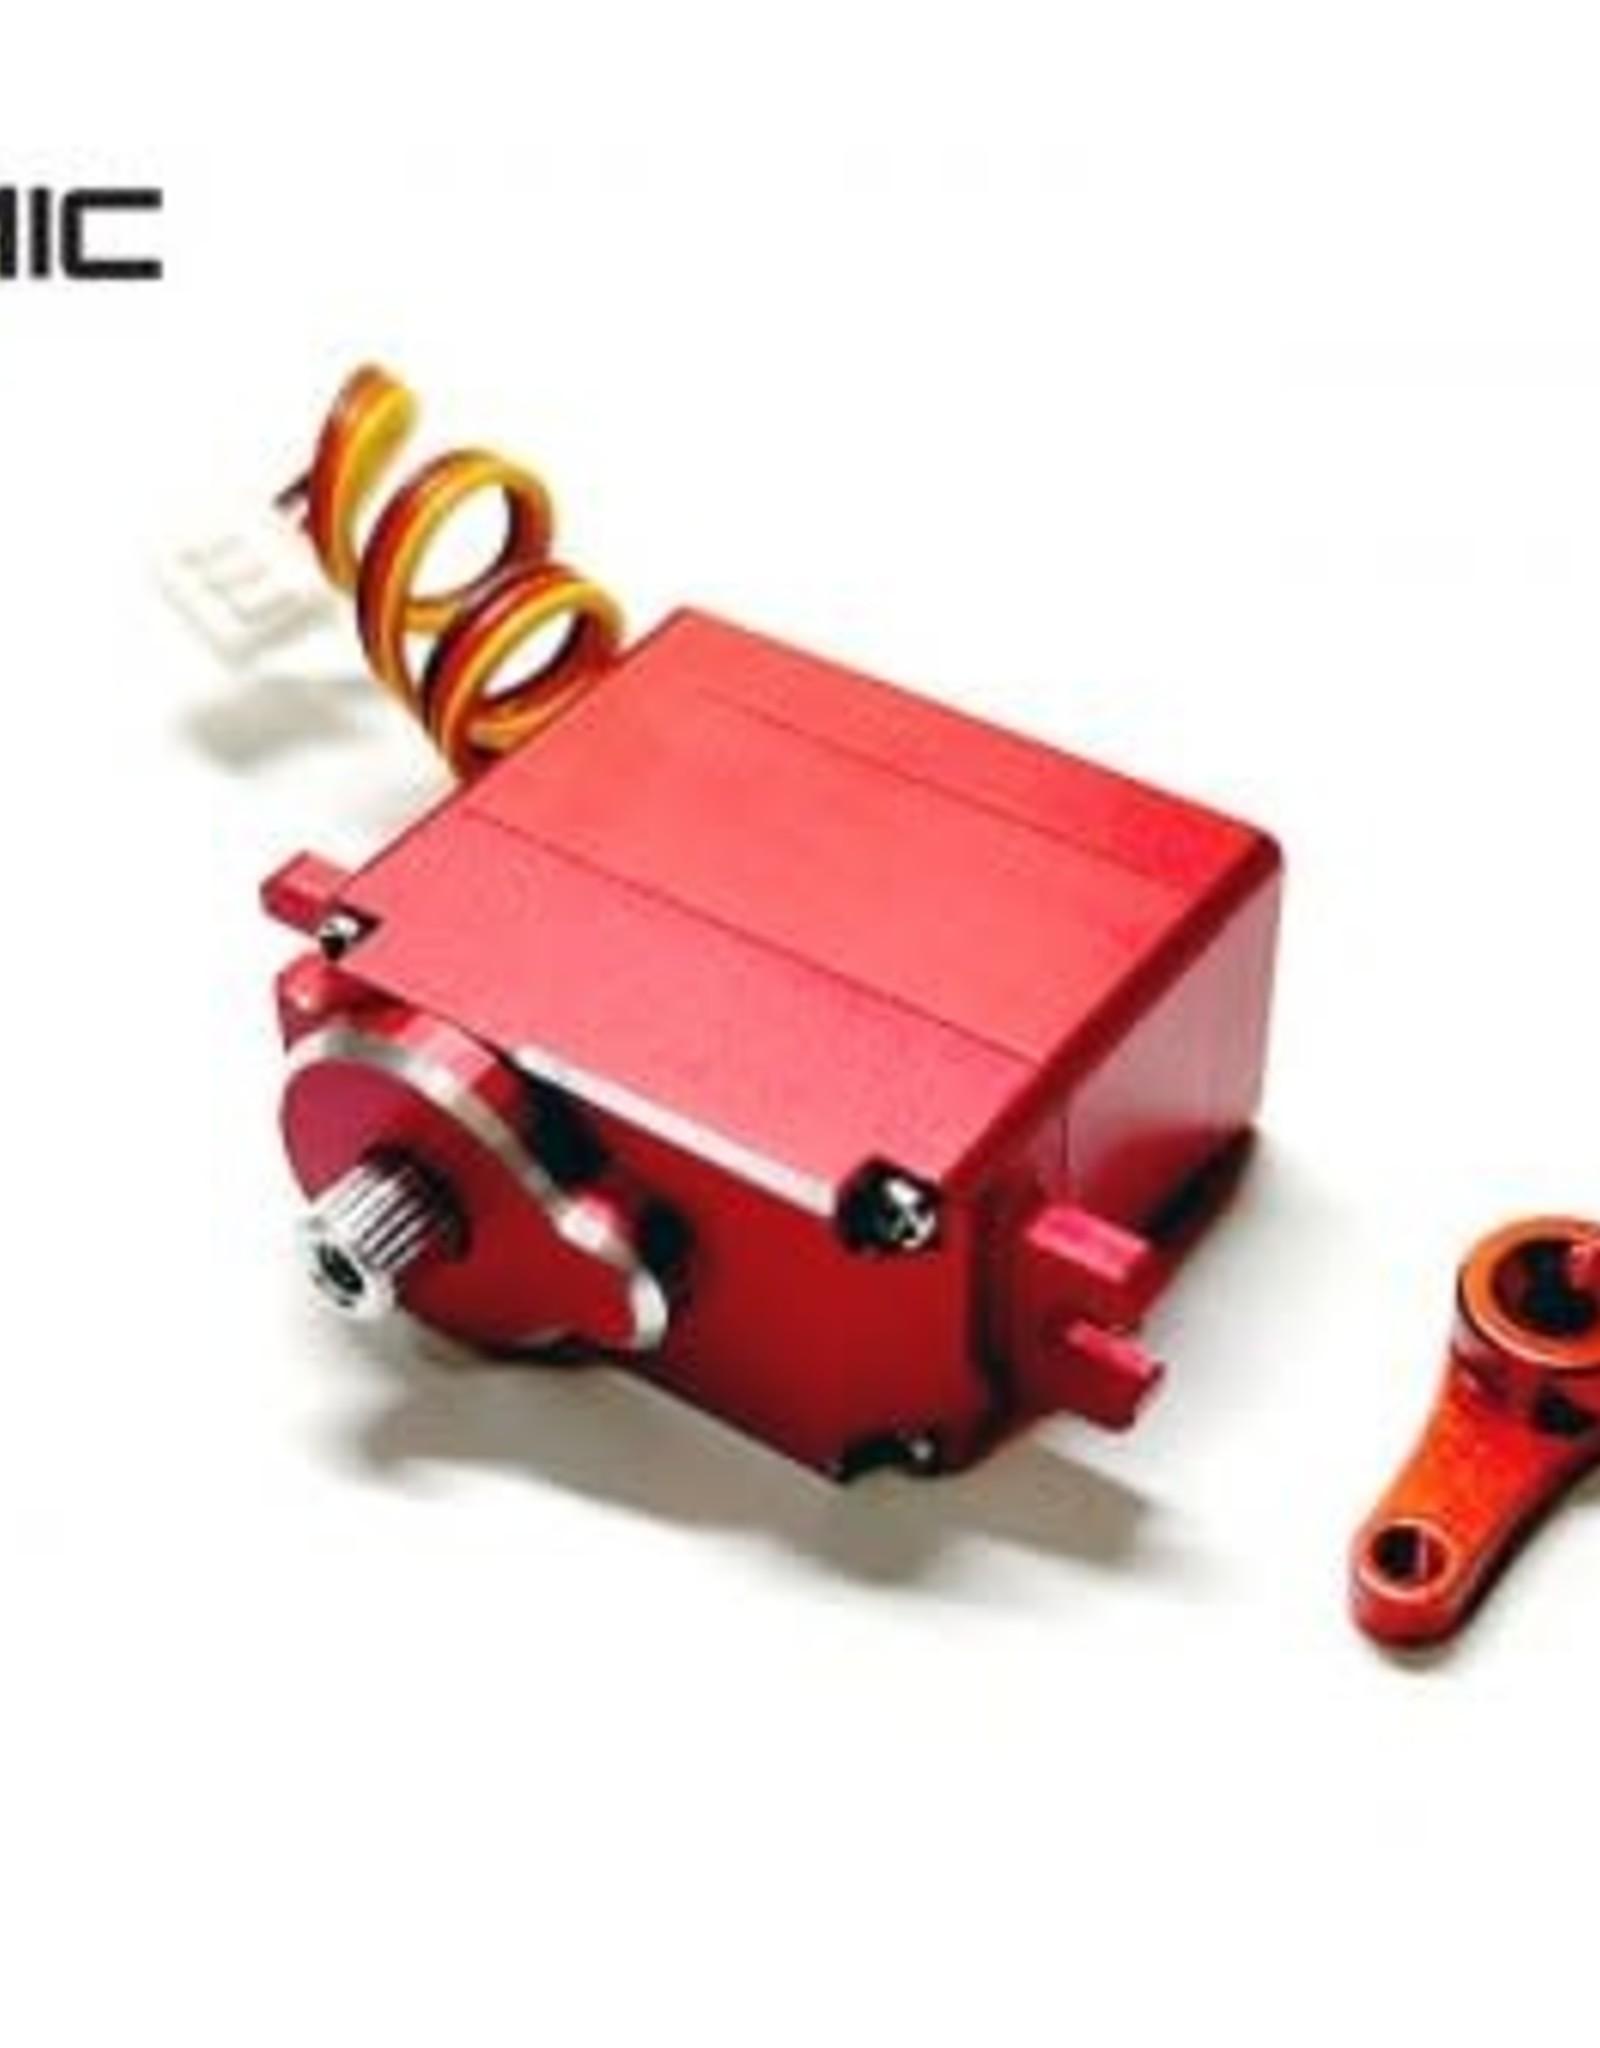 Atomic Digital MG Servo (Hi-Resolution) RED (AMZ, BZ, DRZ, SZ)